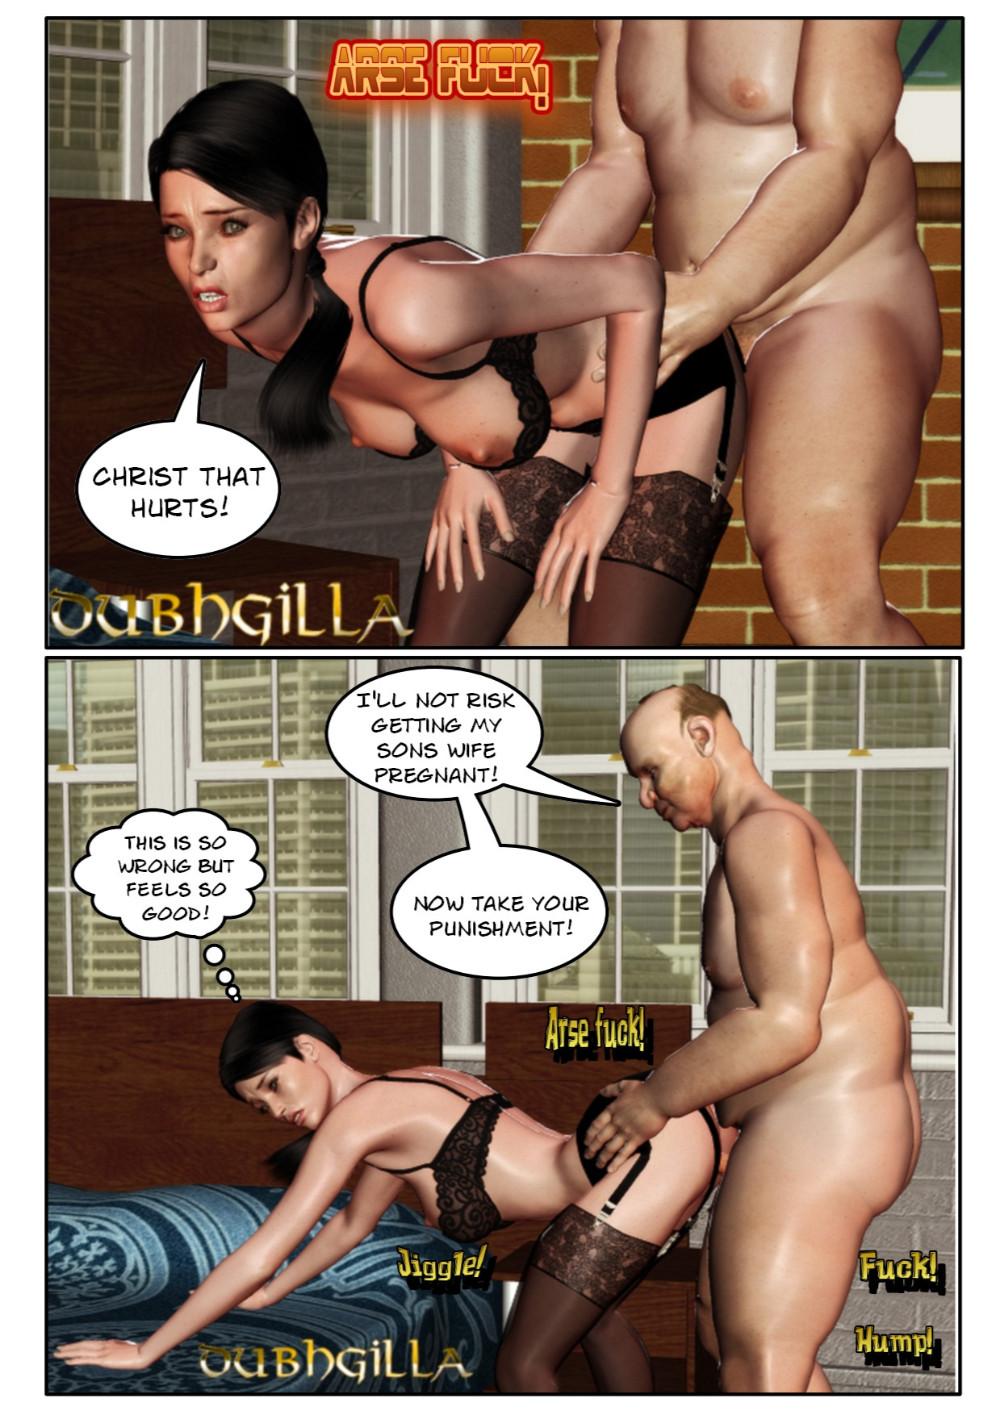 Adult Incest Sex Comics dubhgilla - hot daughter in law   family sex and porn comics